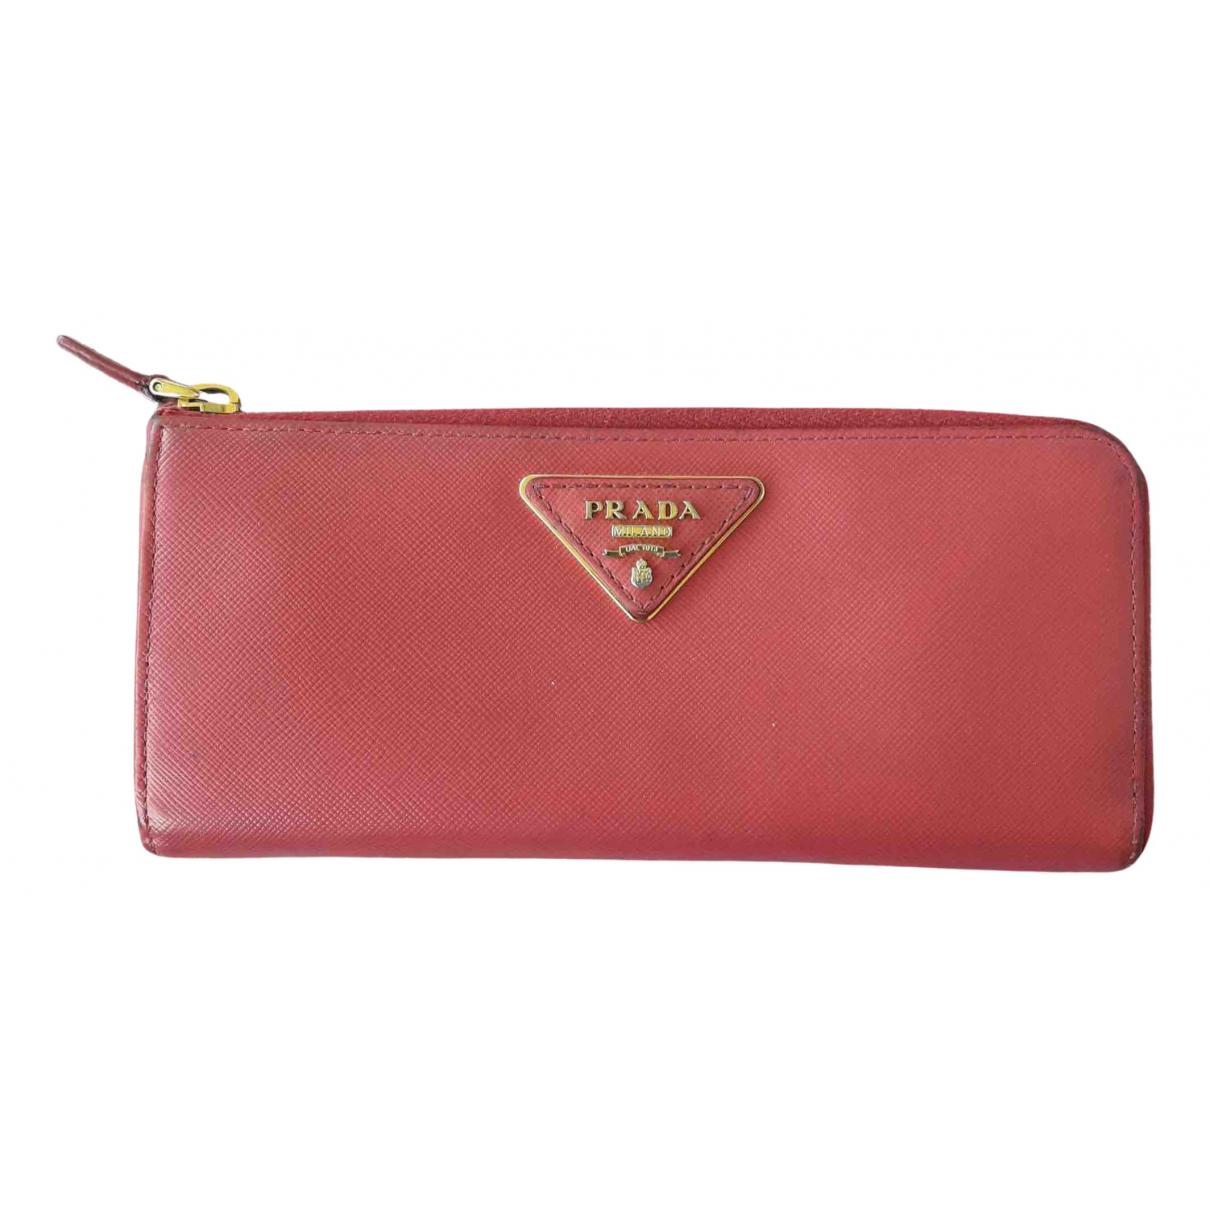 Prada - Pochette   pour femme en cuir - rose